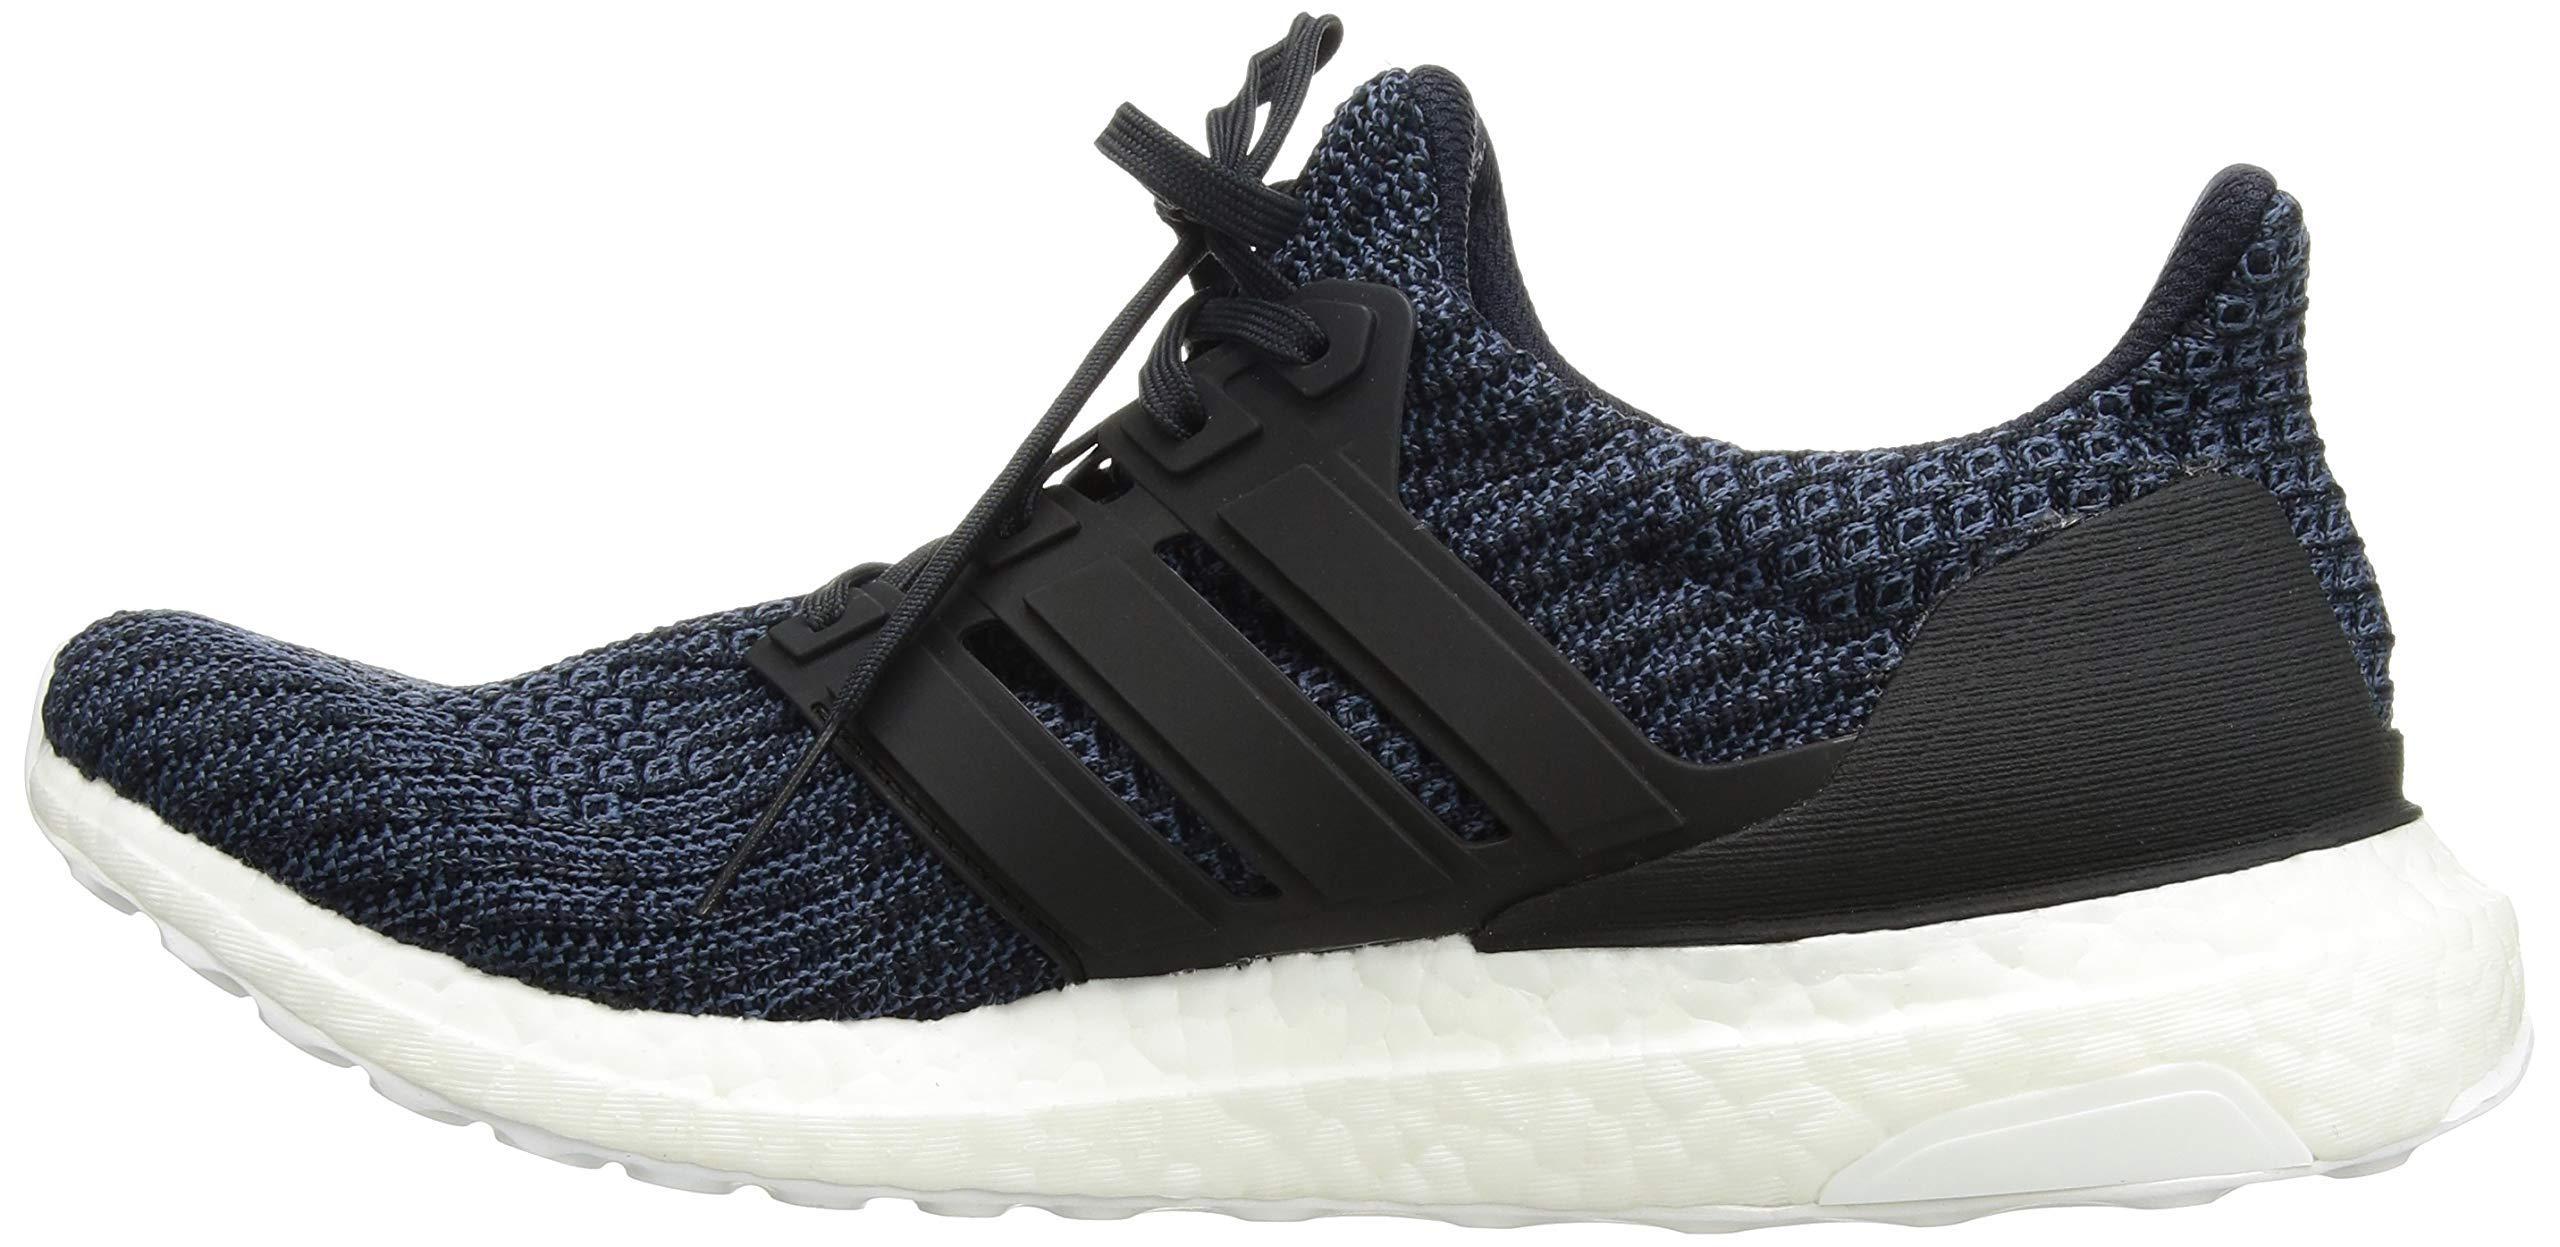 outlet store 72a21 678e2 adidas Women's Ultraboost Parley Running Shoe, legend ink/carbon/blue  spirit, 8.5 M US